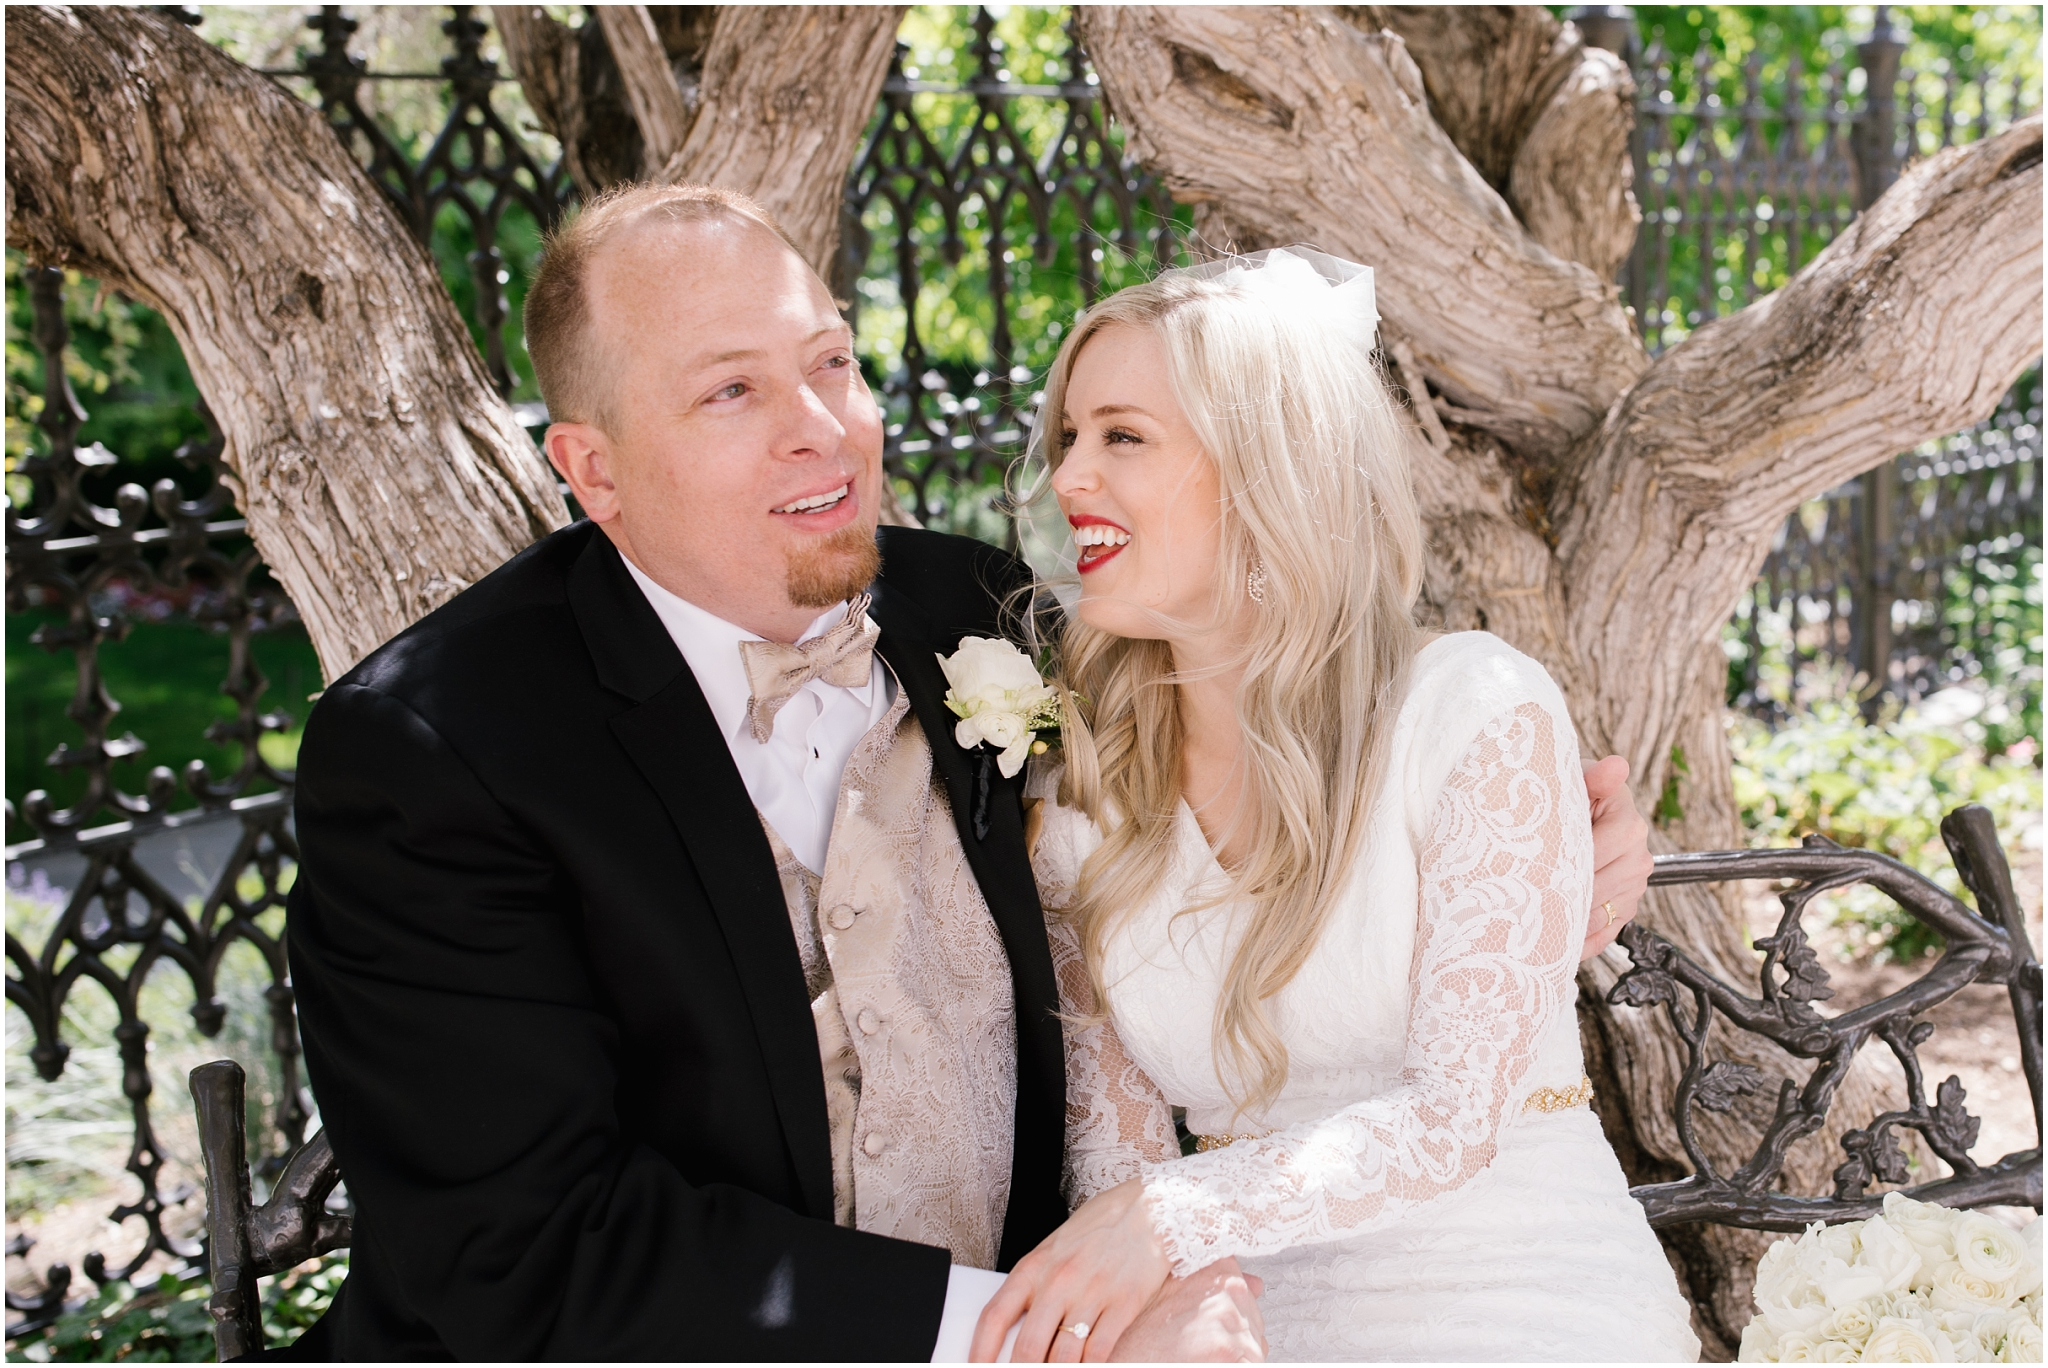 CherylandTyler-197_Lizzie-B-Imagery-Utah-Wedding-Photographer-Salt-Lake-City-Temple-Wells-Fargo-Building-Reception.jpg